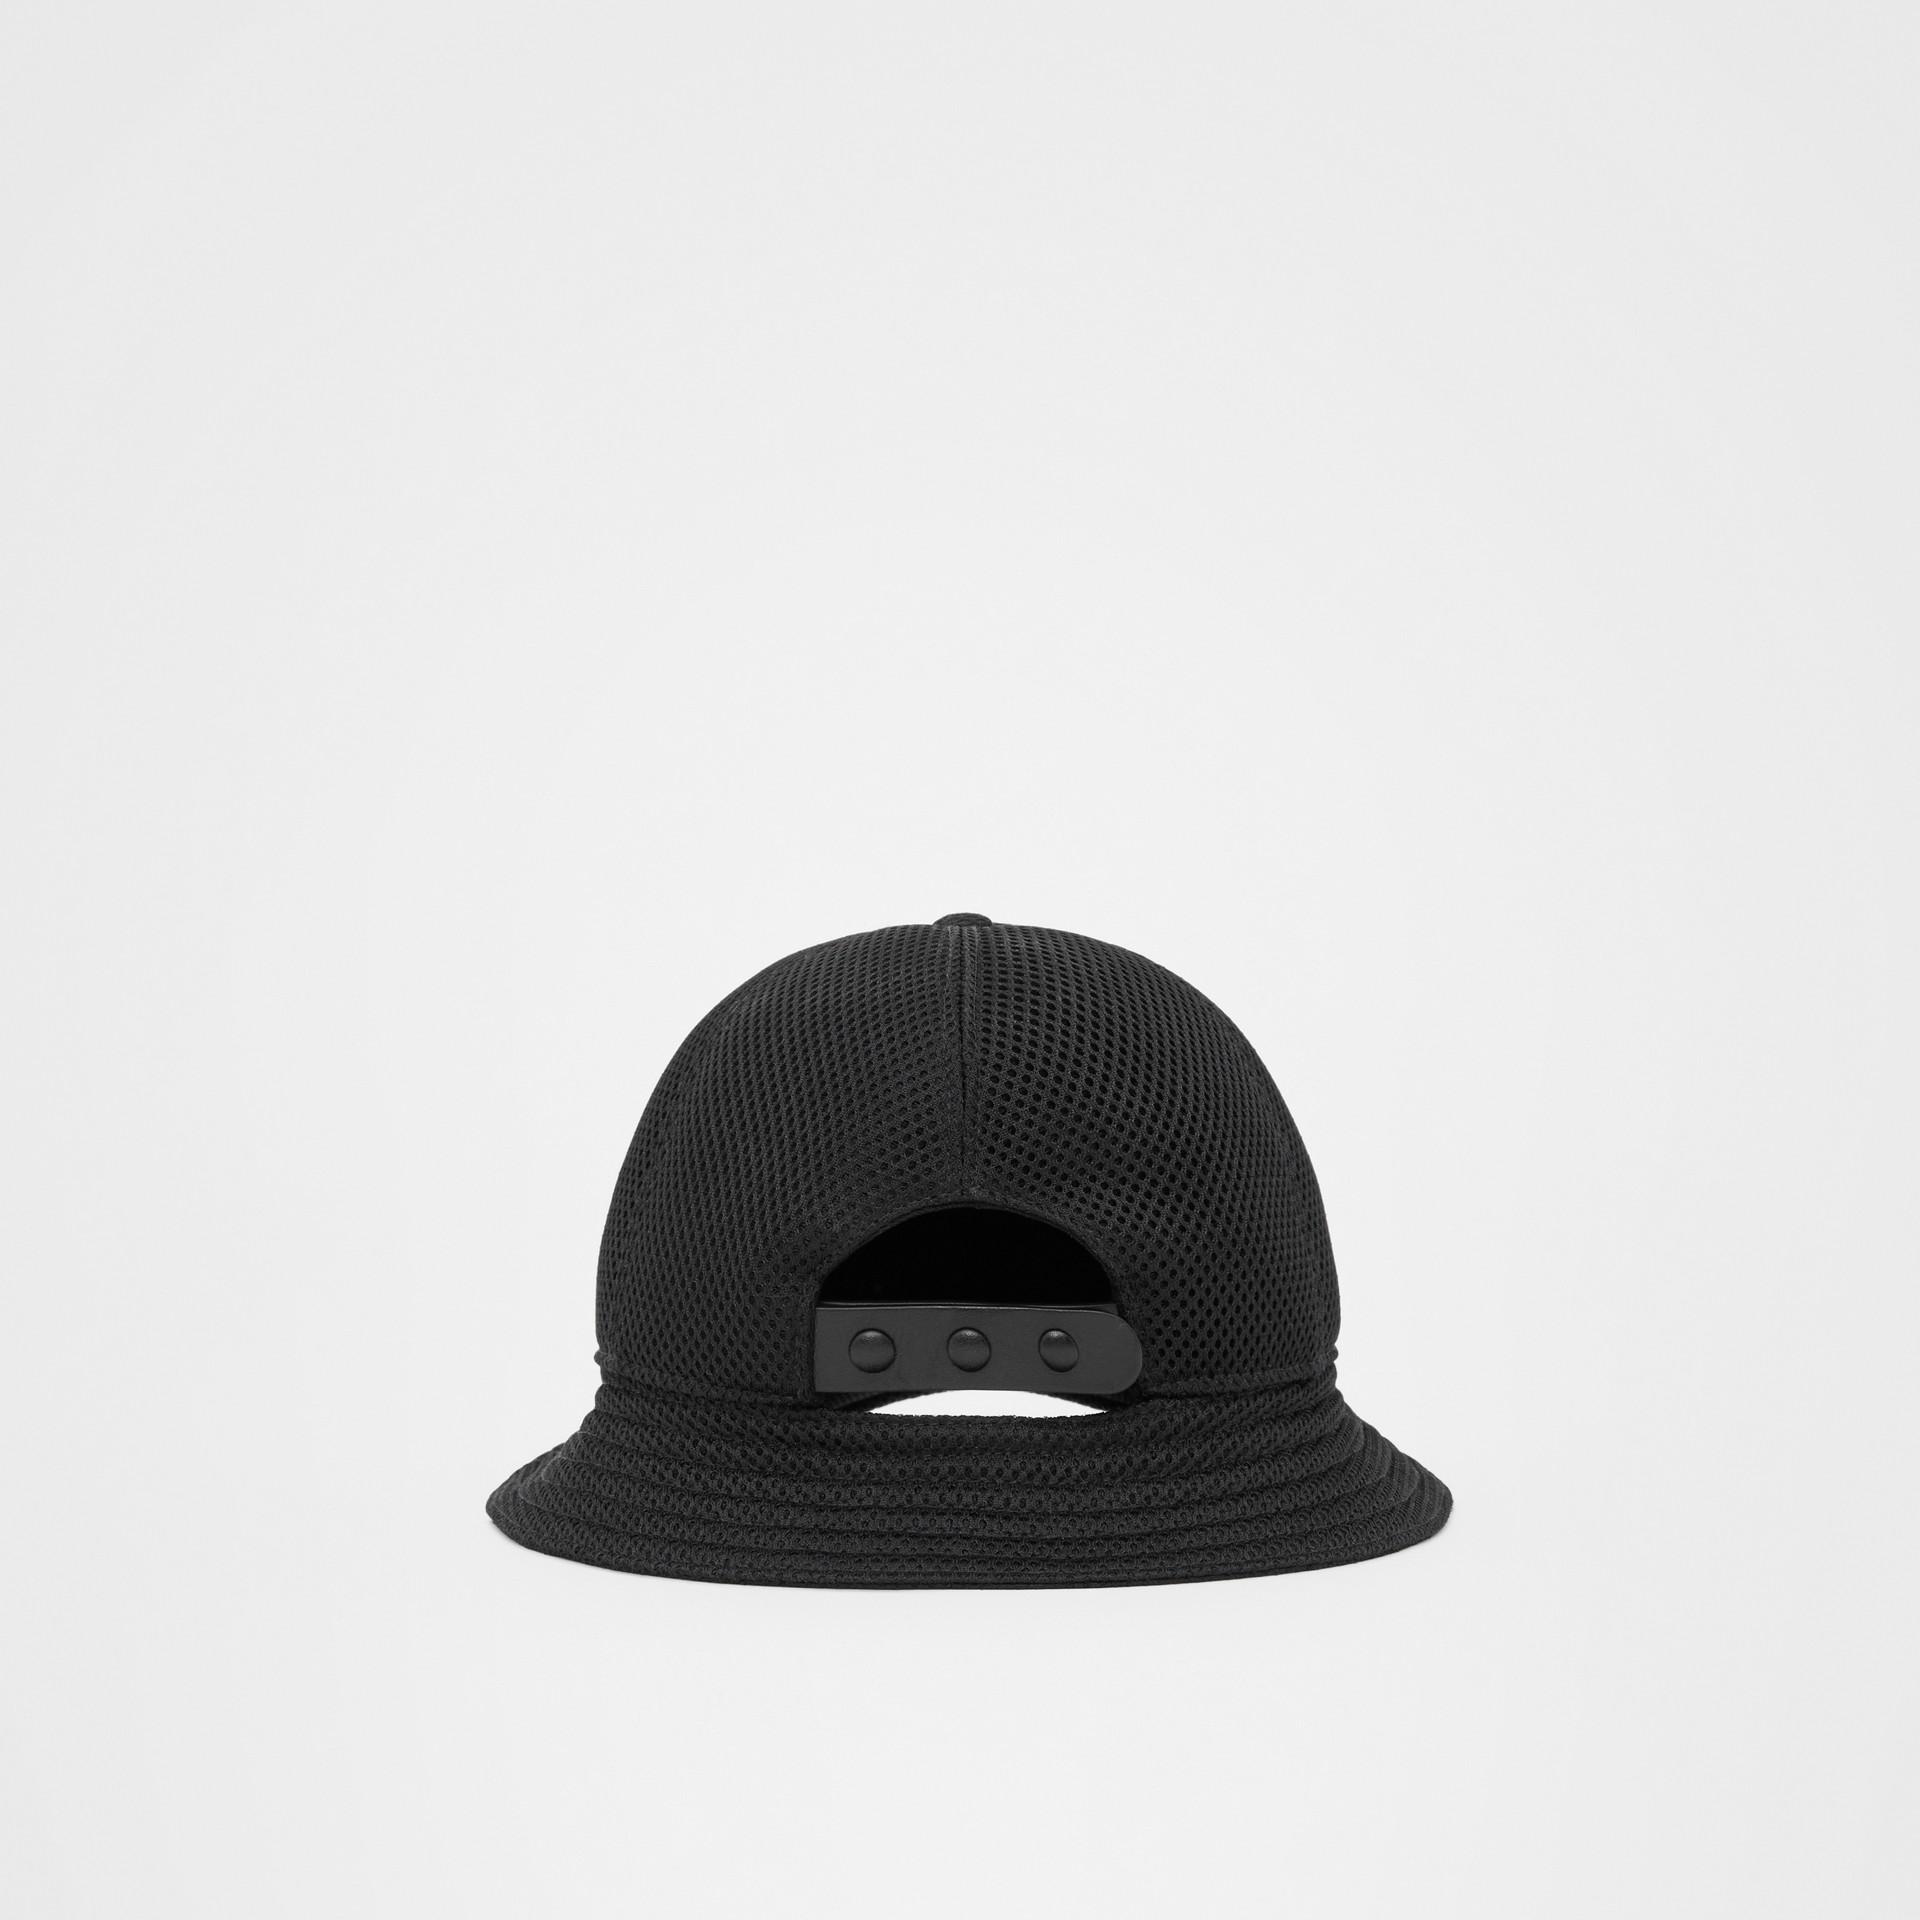 Monogram Motif Reconstructed Baseball Cap in Black   Burberry - gallery image 5